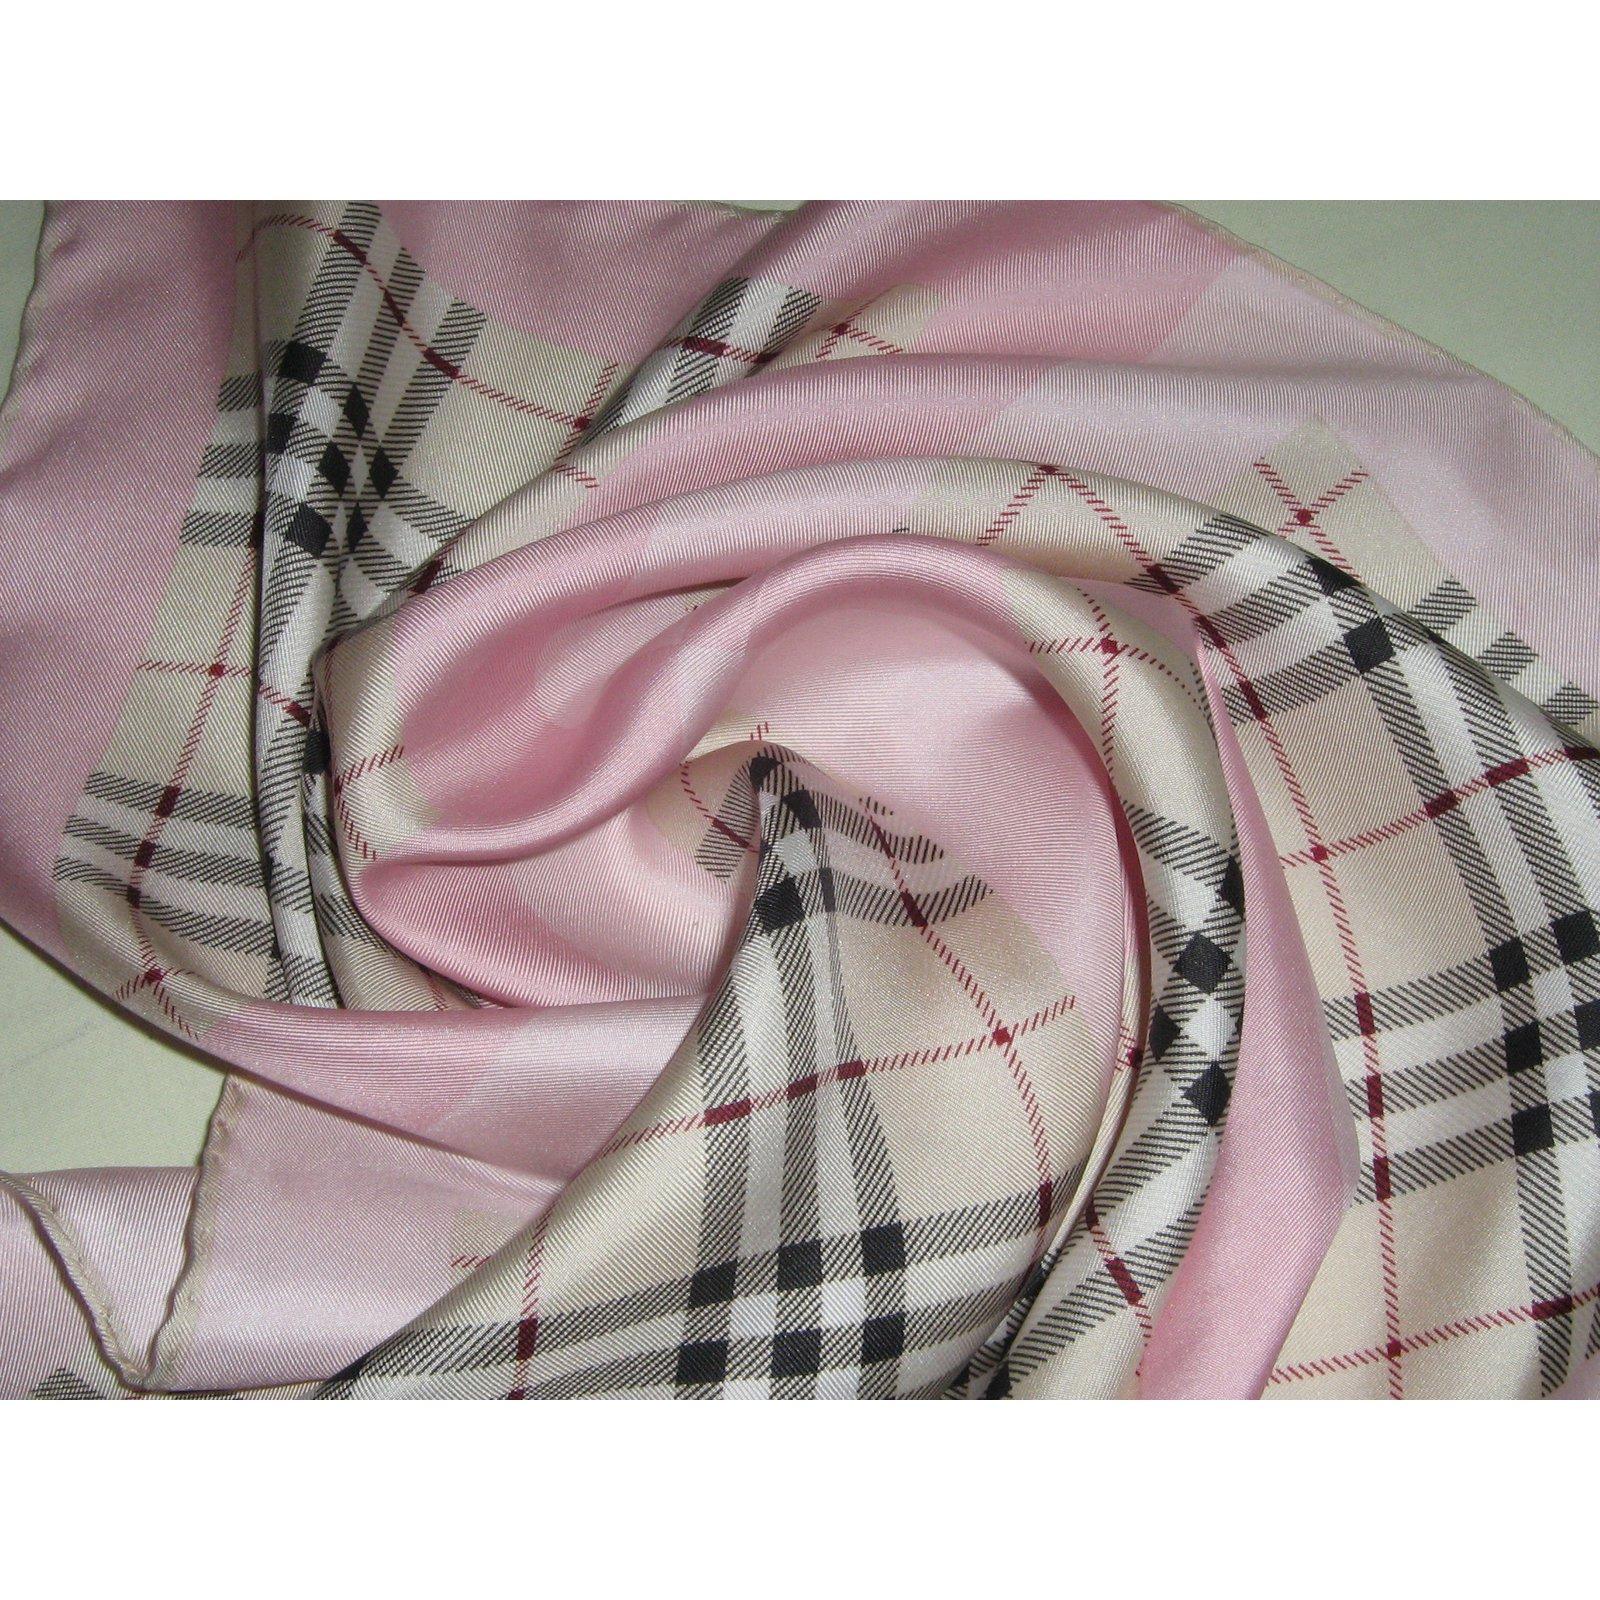 ad8f21b27e4c Foulards Burberry BURBERRY GAVROCHE FOULARD PETIT CARRE BABY ROSE 45X45  Satin Rose ref.60046 - Joli Closet